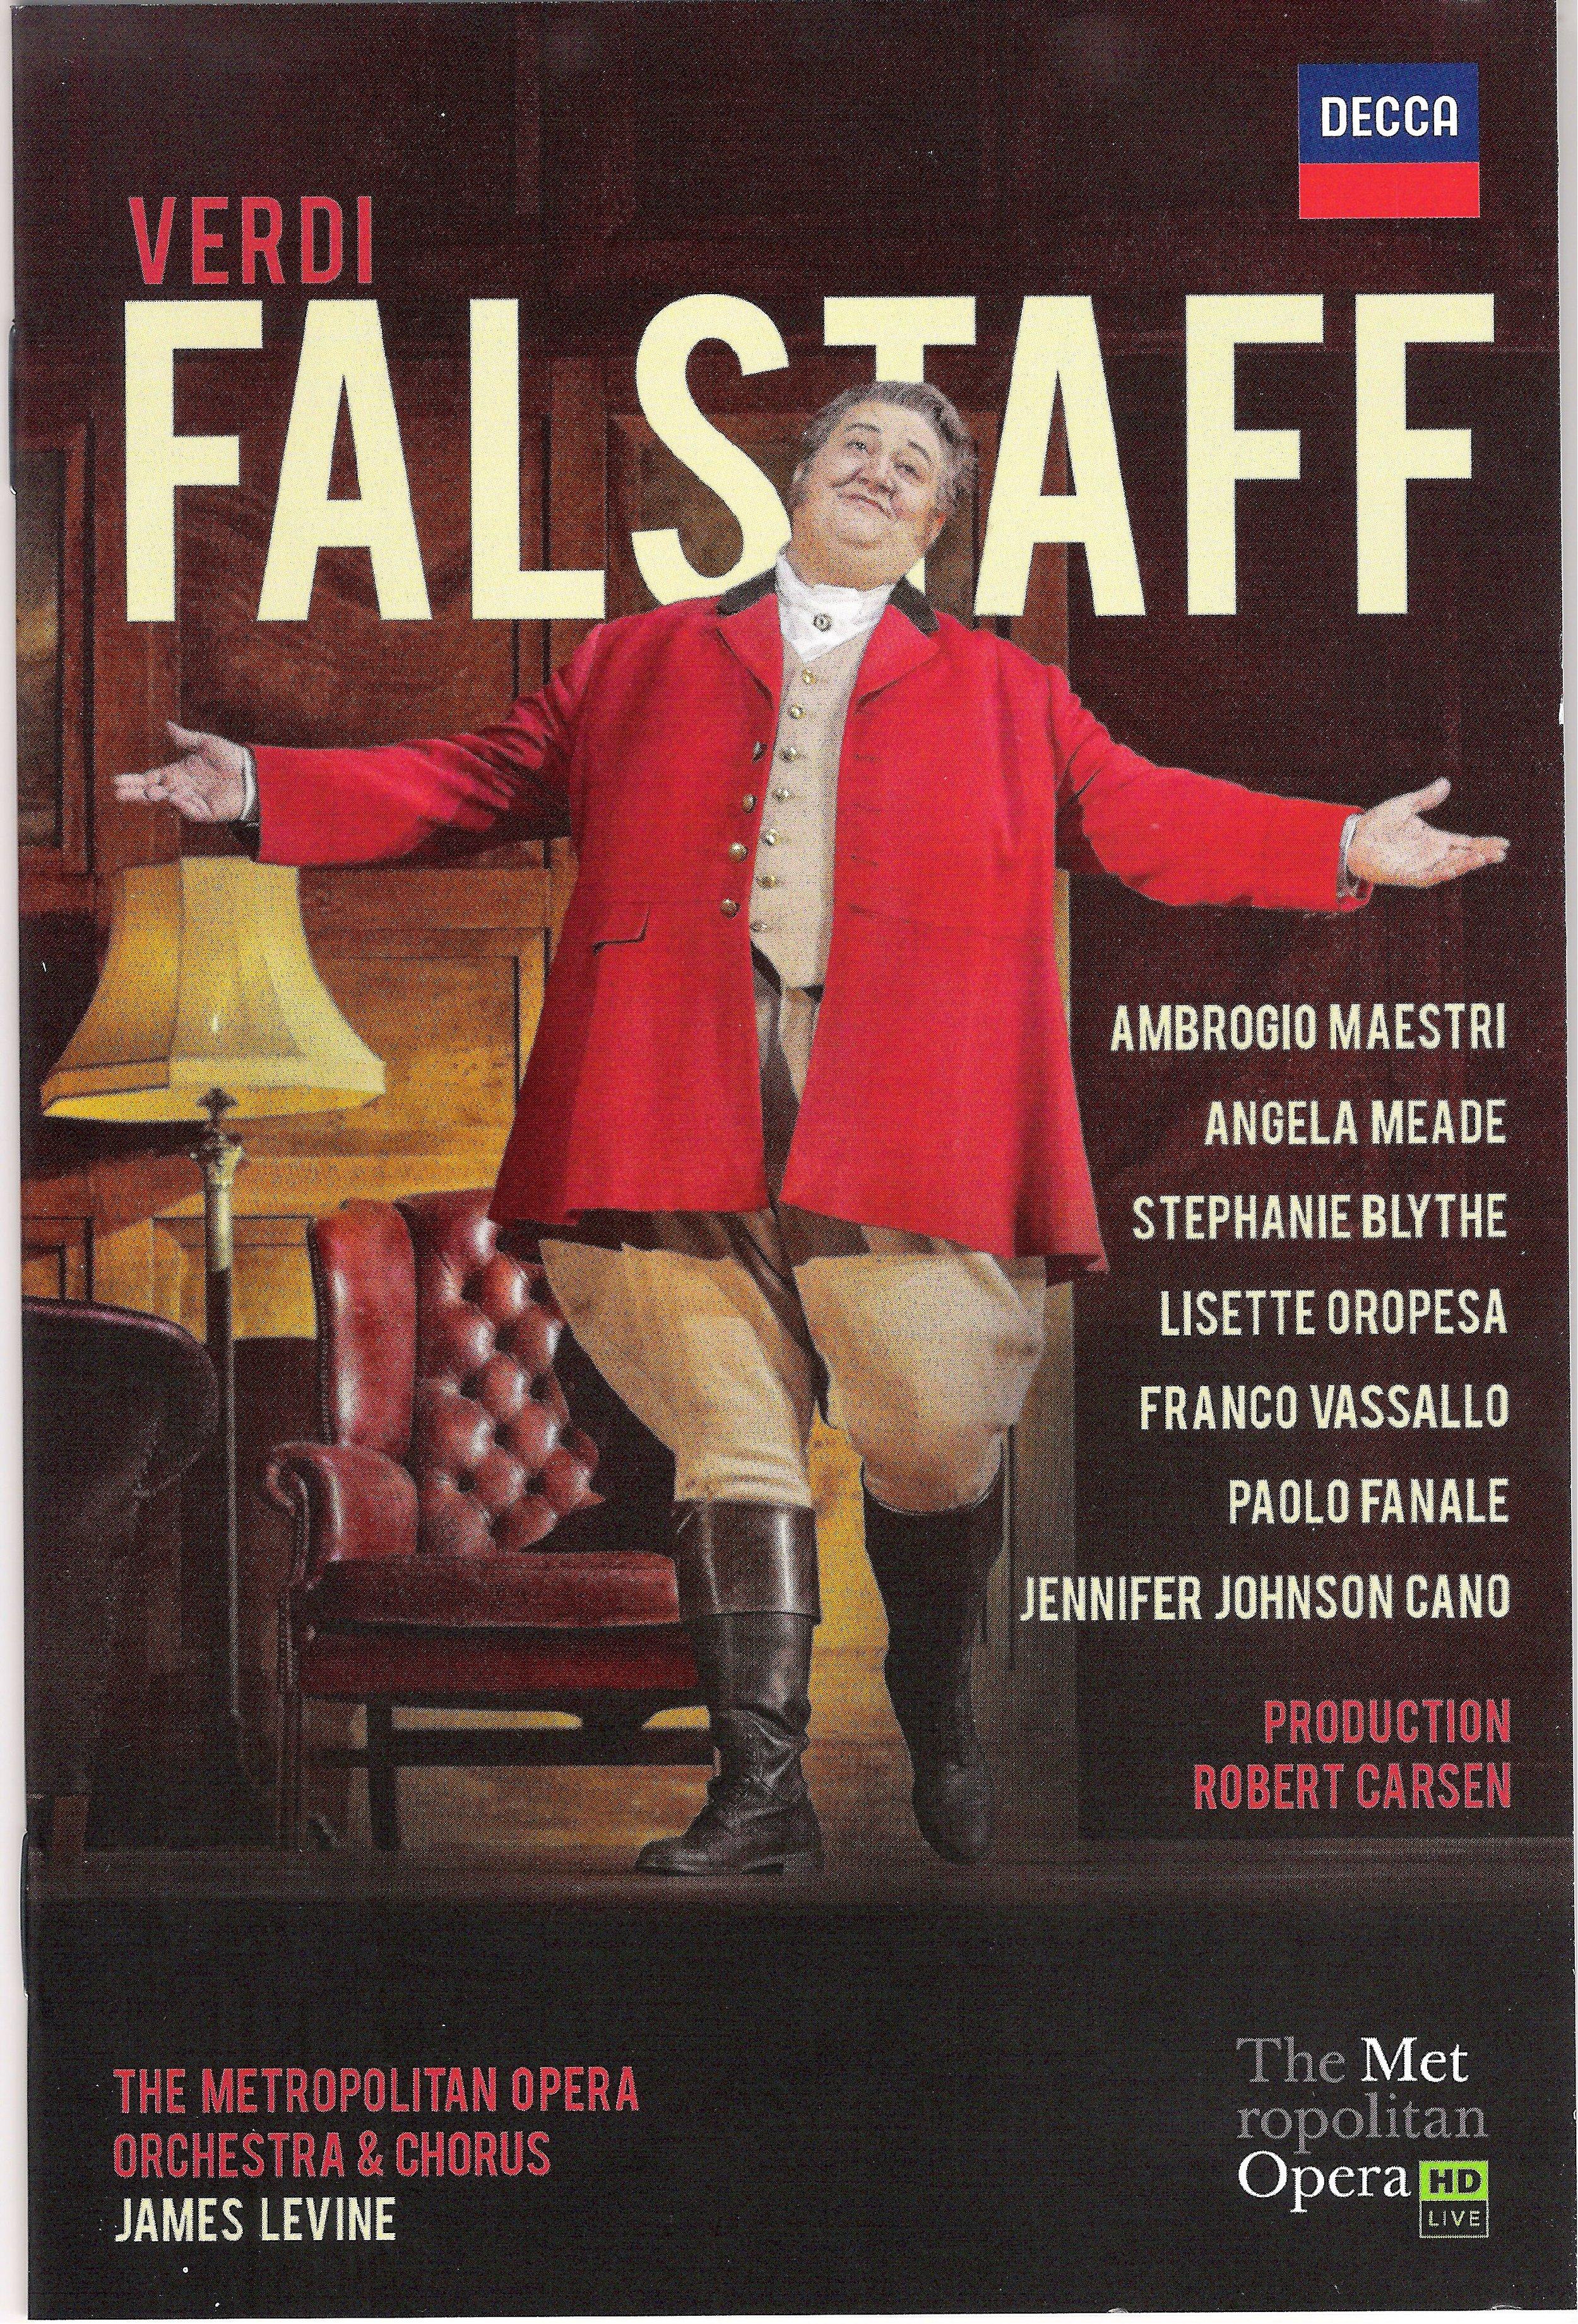 Ambrogio Maestri as Verdi's Falstaff